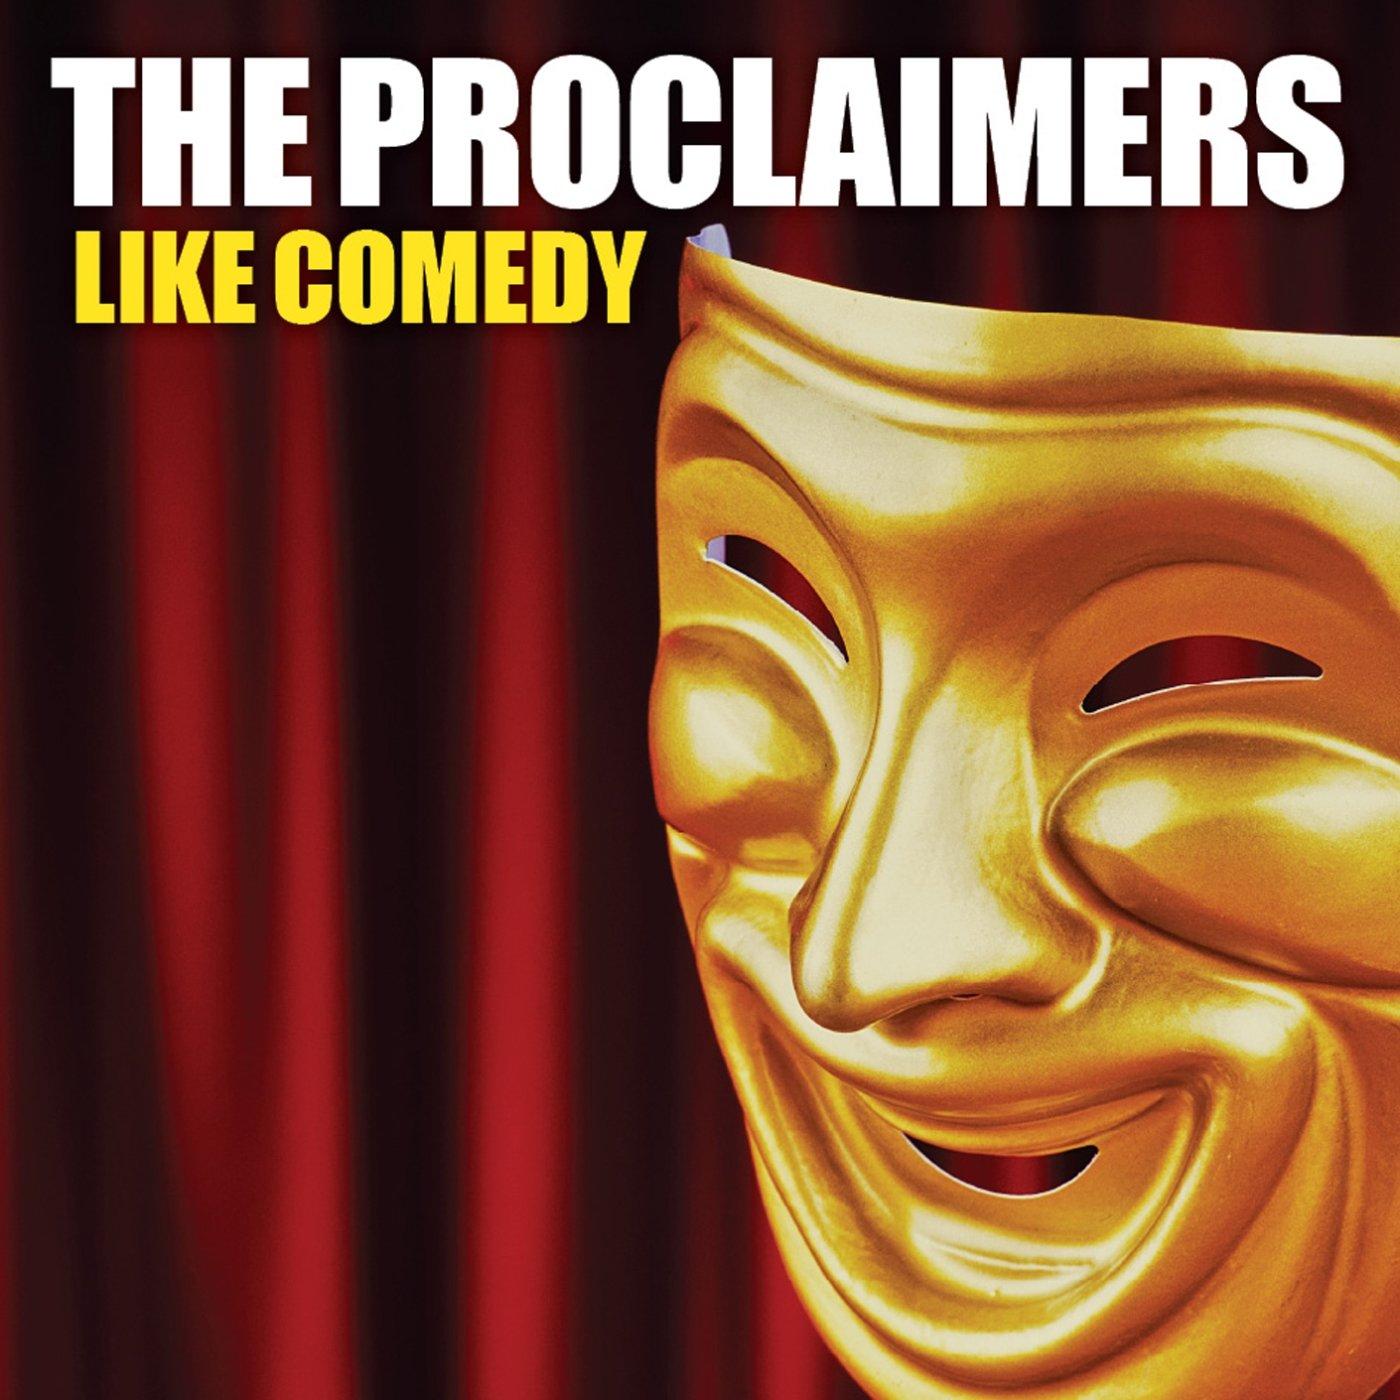 The proclaimers | music fanart | fanart. Tv.